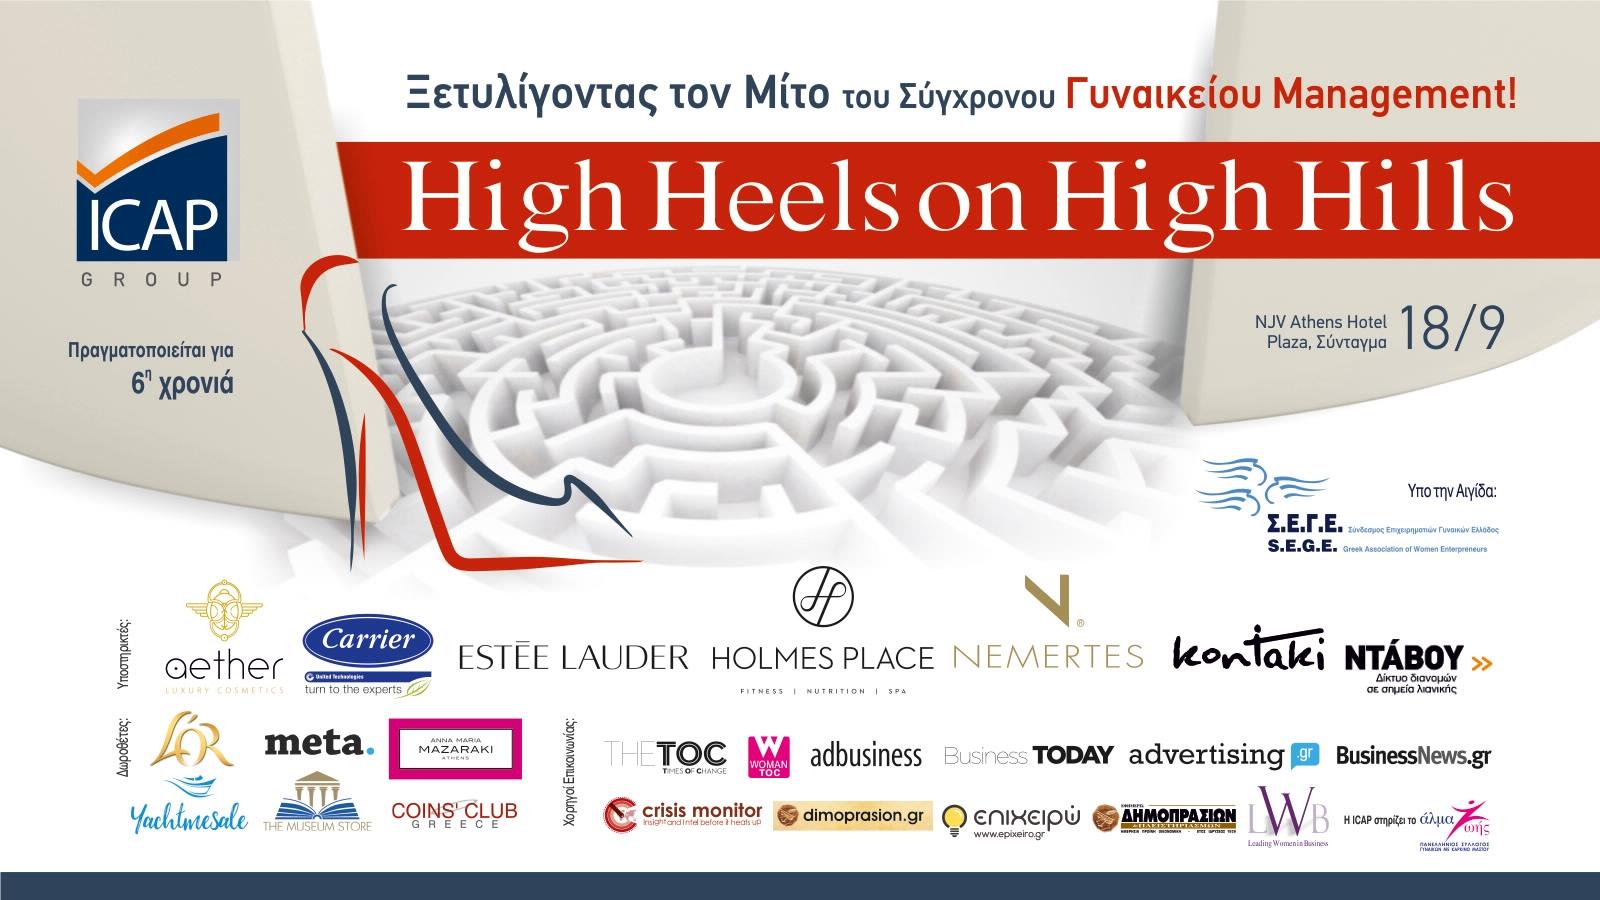 Holmes Place | Women on top! Η γυναικεία επιχειρηματικότητα στην Ελλάδα